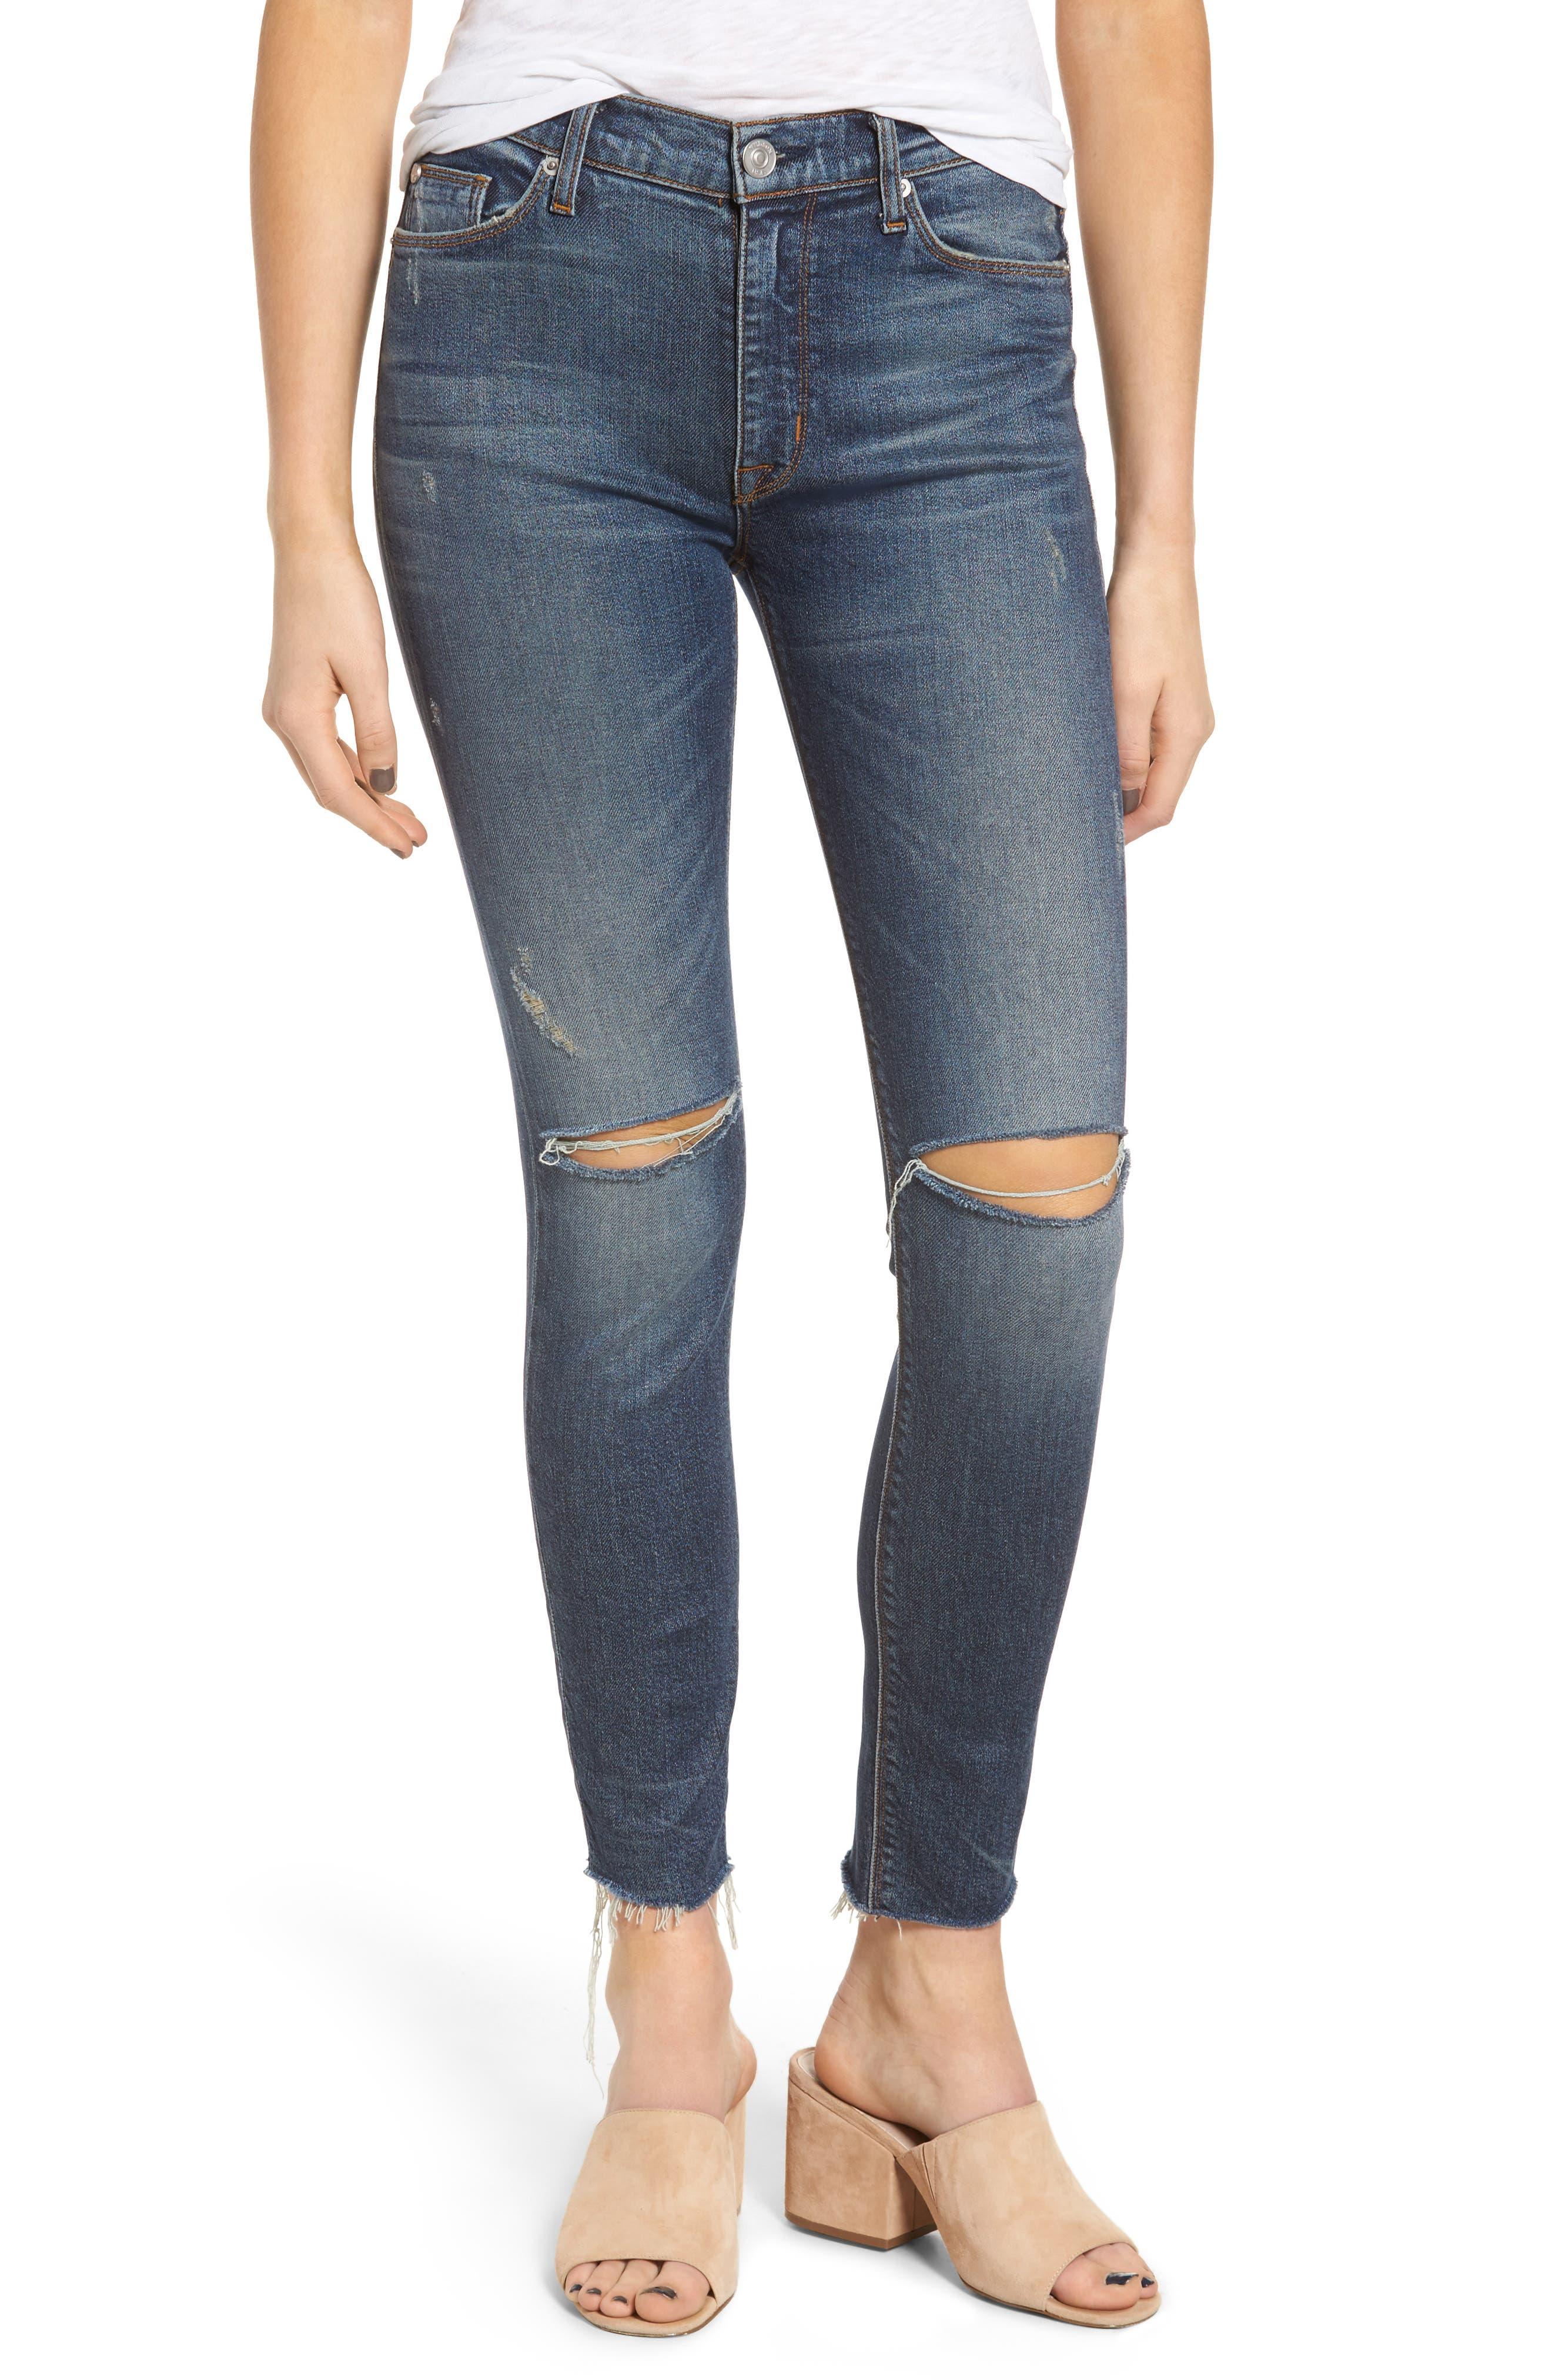 Barbara High Waist Skinny Jeans,                         Main,                         color, Nowhere Girl